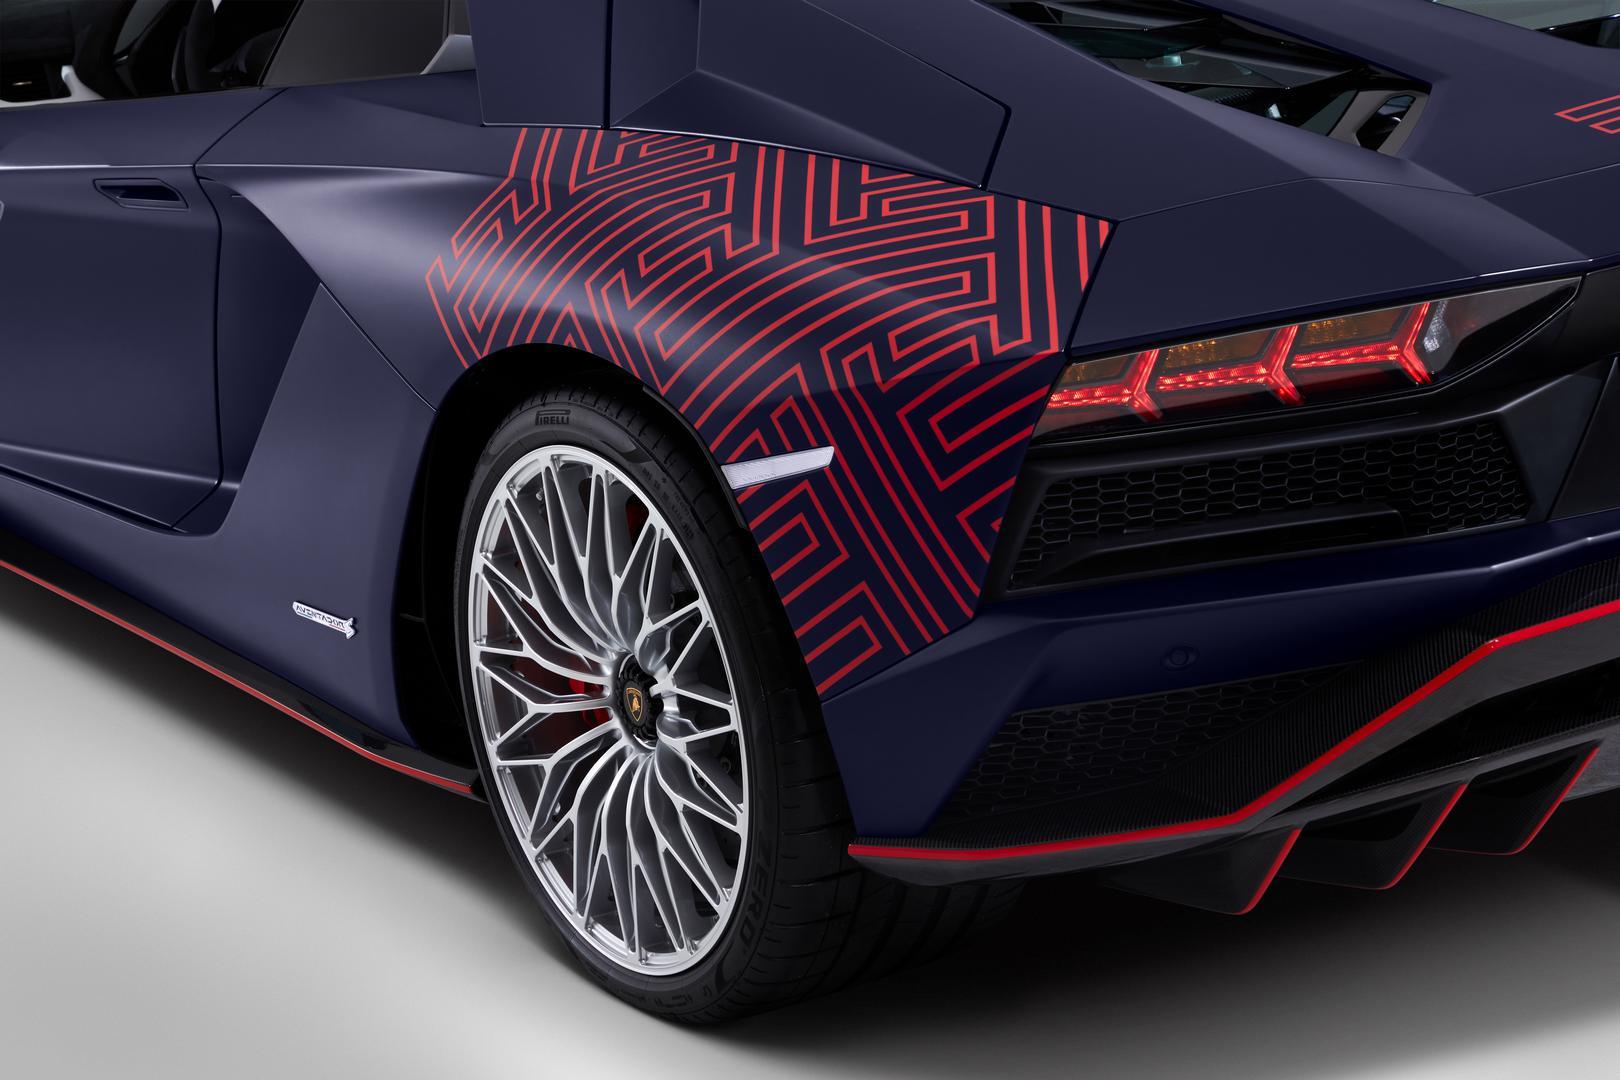 Aventador S Roadster wheels